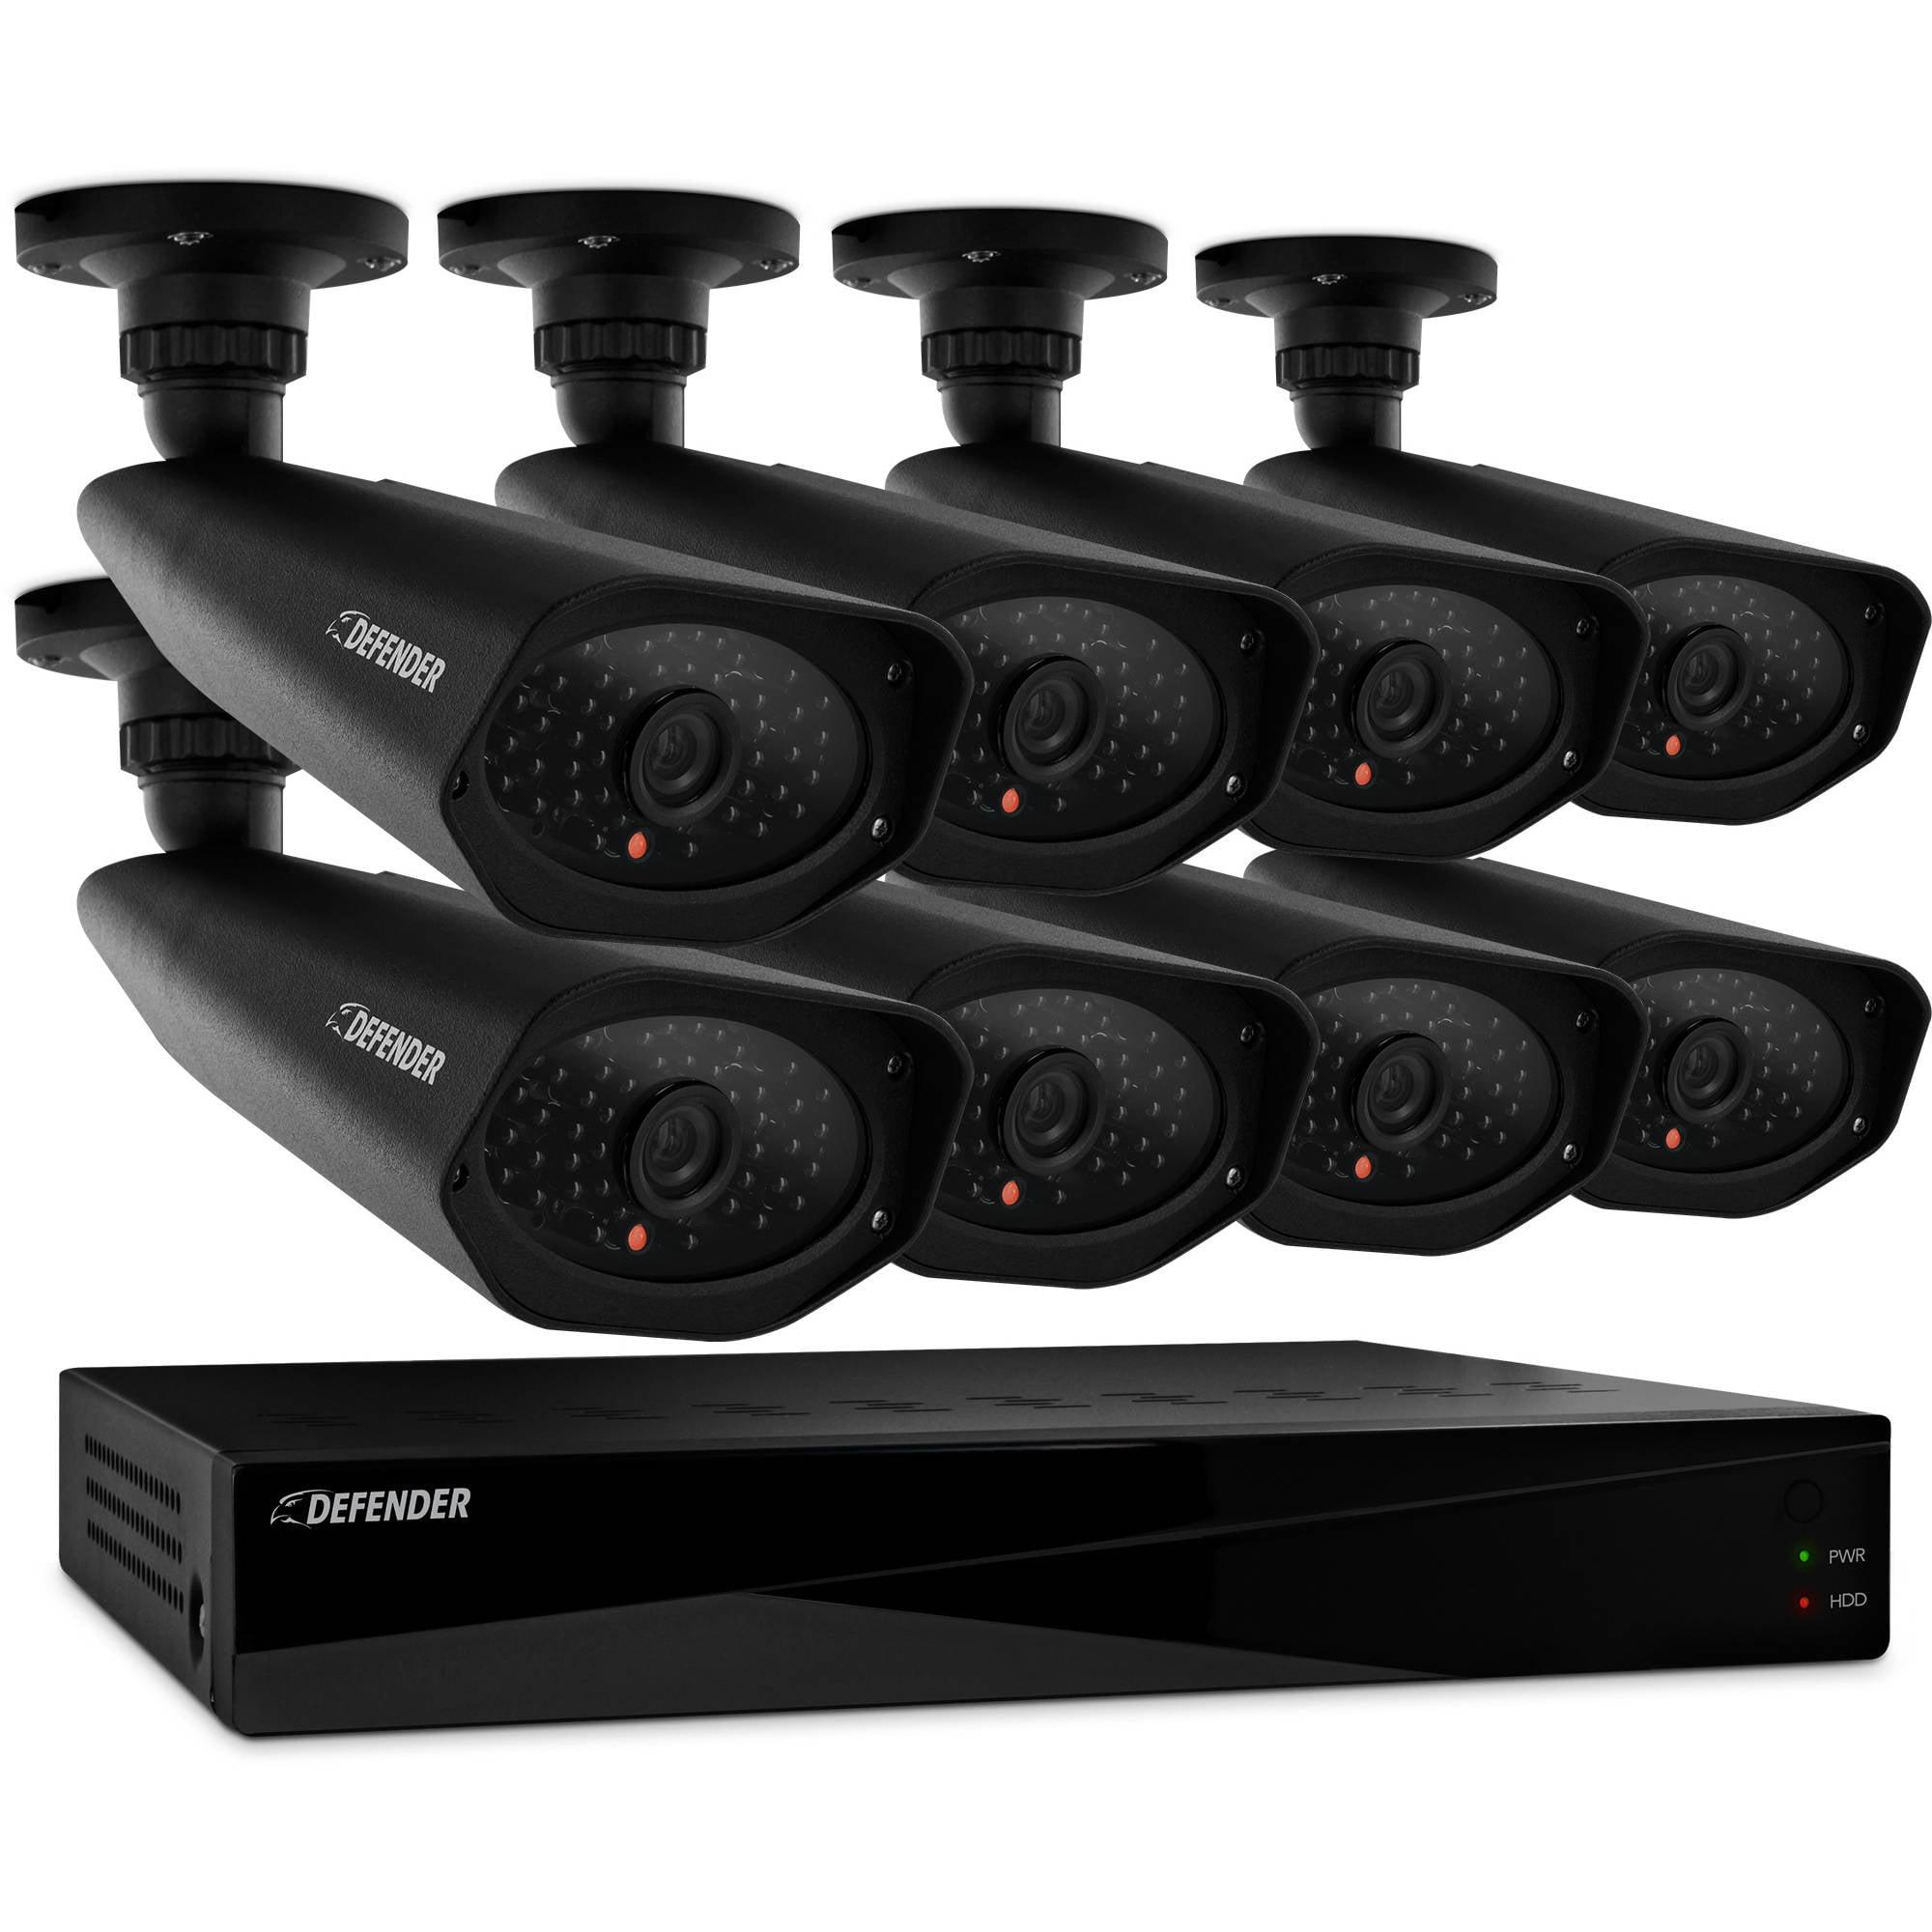 DEFENDER PRO Sentinel 8CH Smart Security DVR with 8 Hi-Res Outdoor Security Cameras